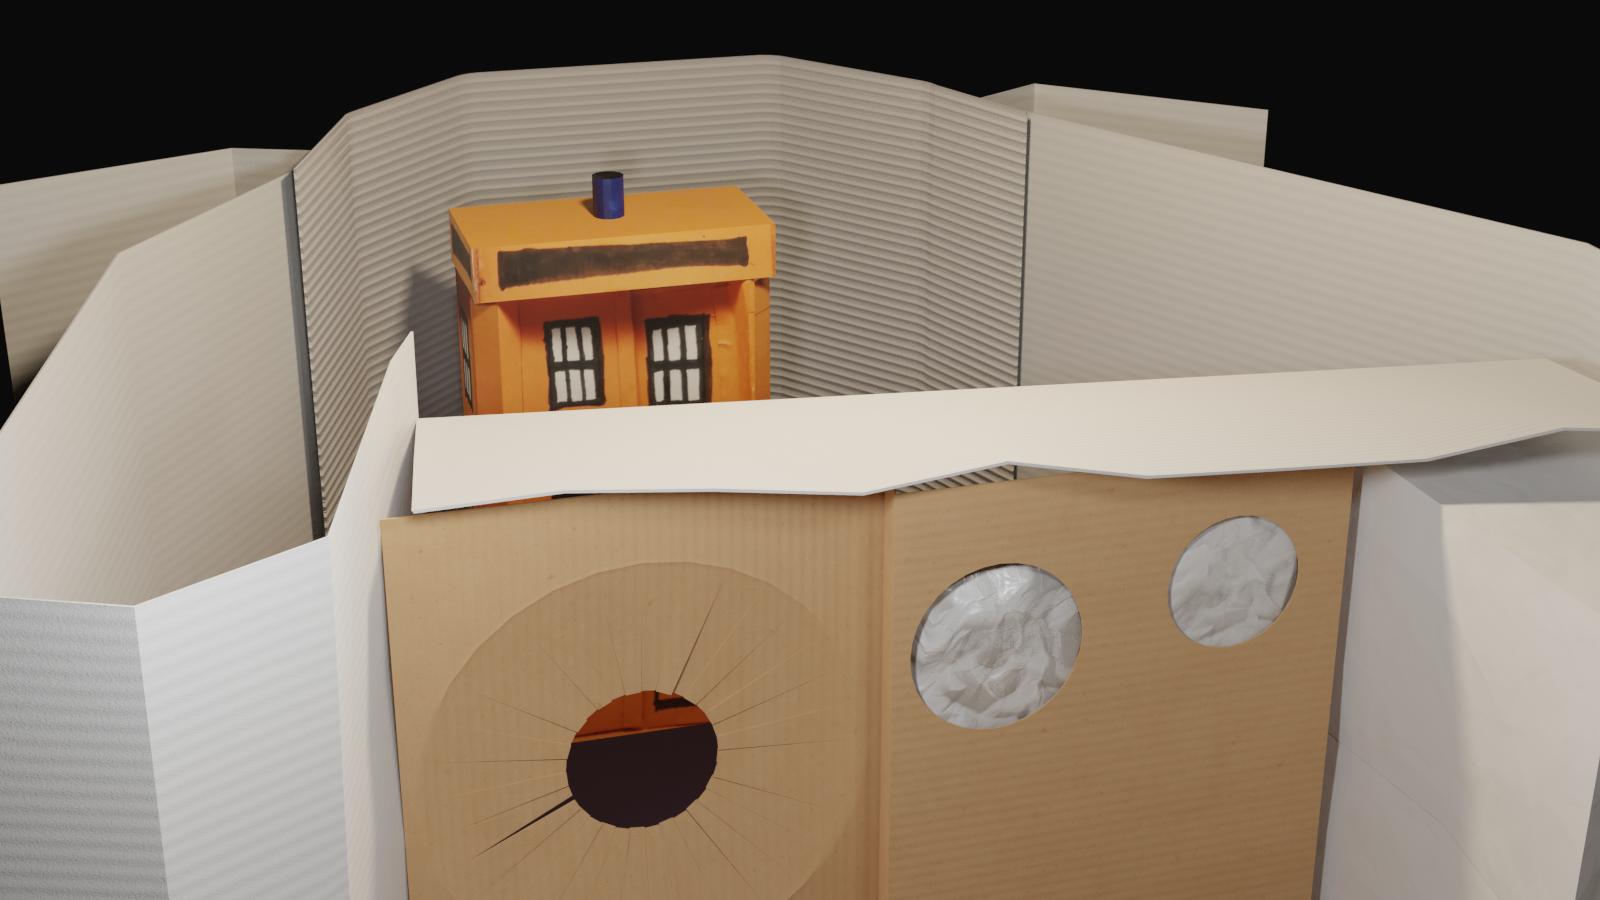 Cardboard TV set 2